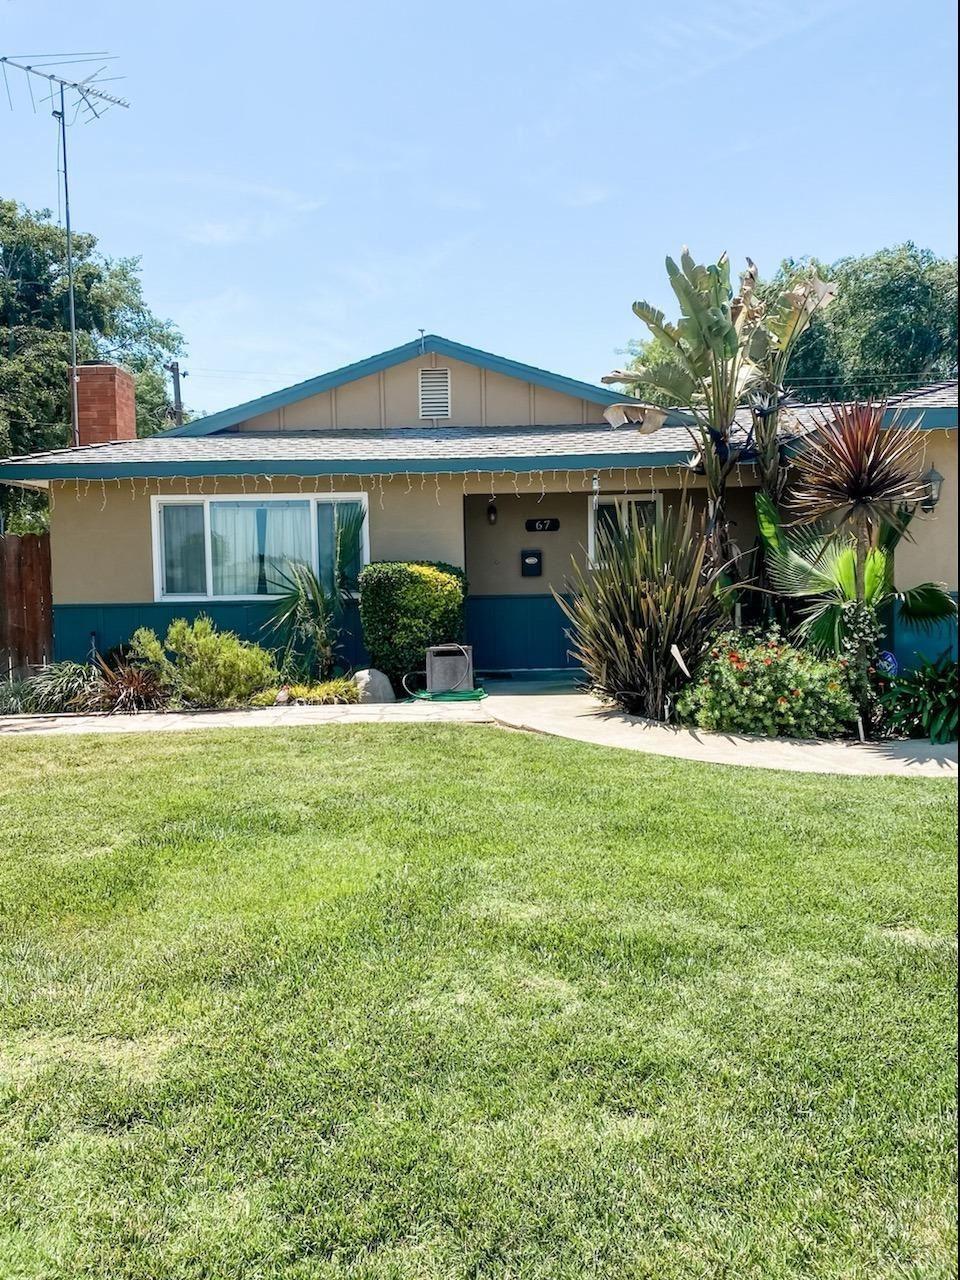 67 W Spruce Avenue, Lemoore, CA 93245 - MLS#: 221970